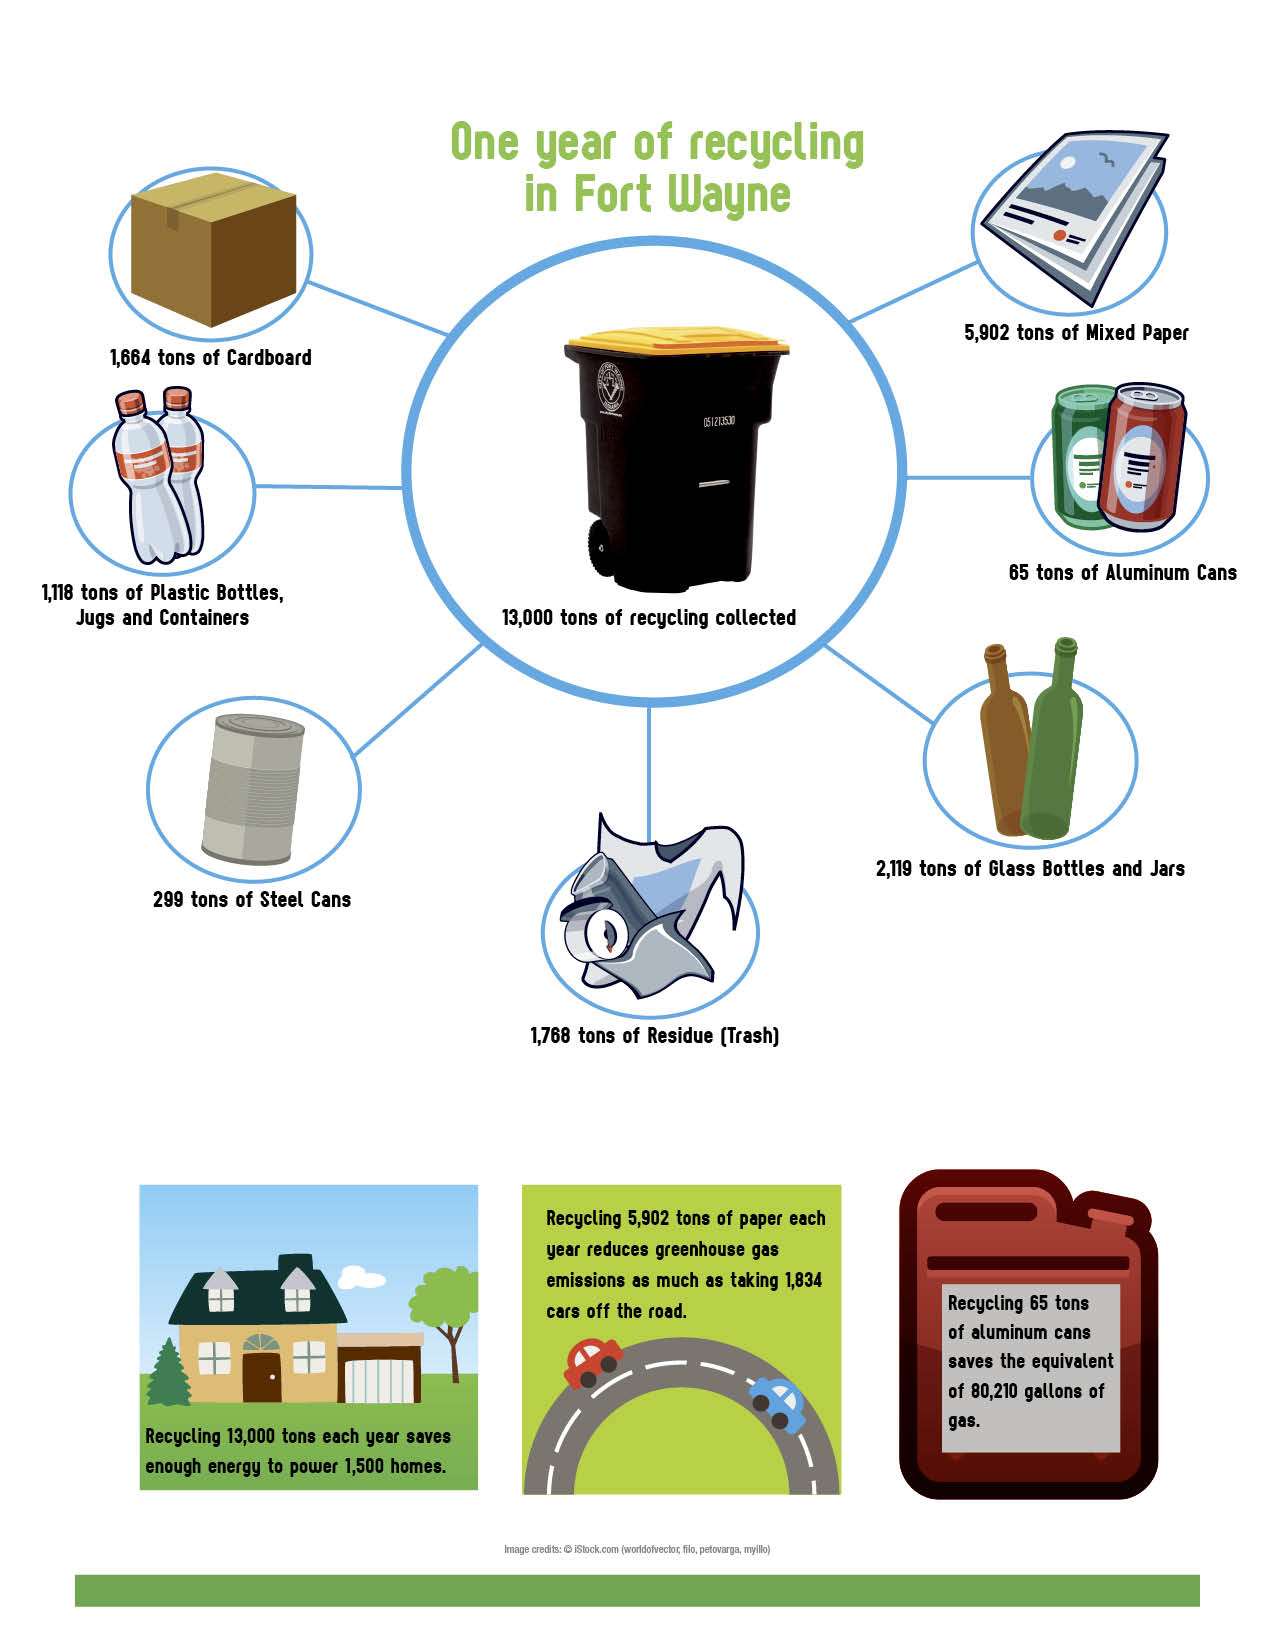 One Cart Recycling Program